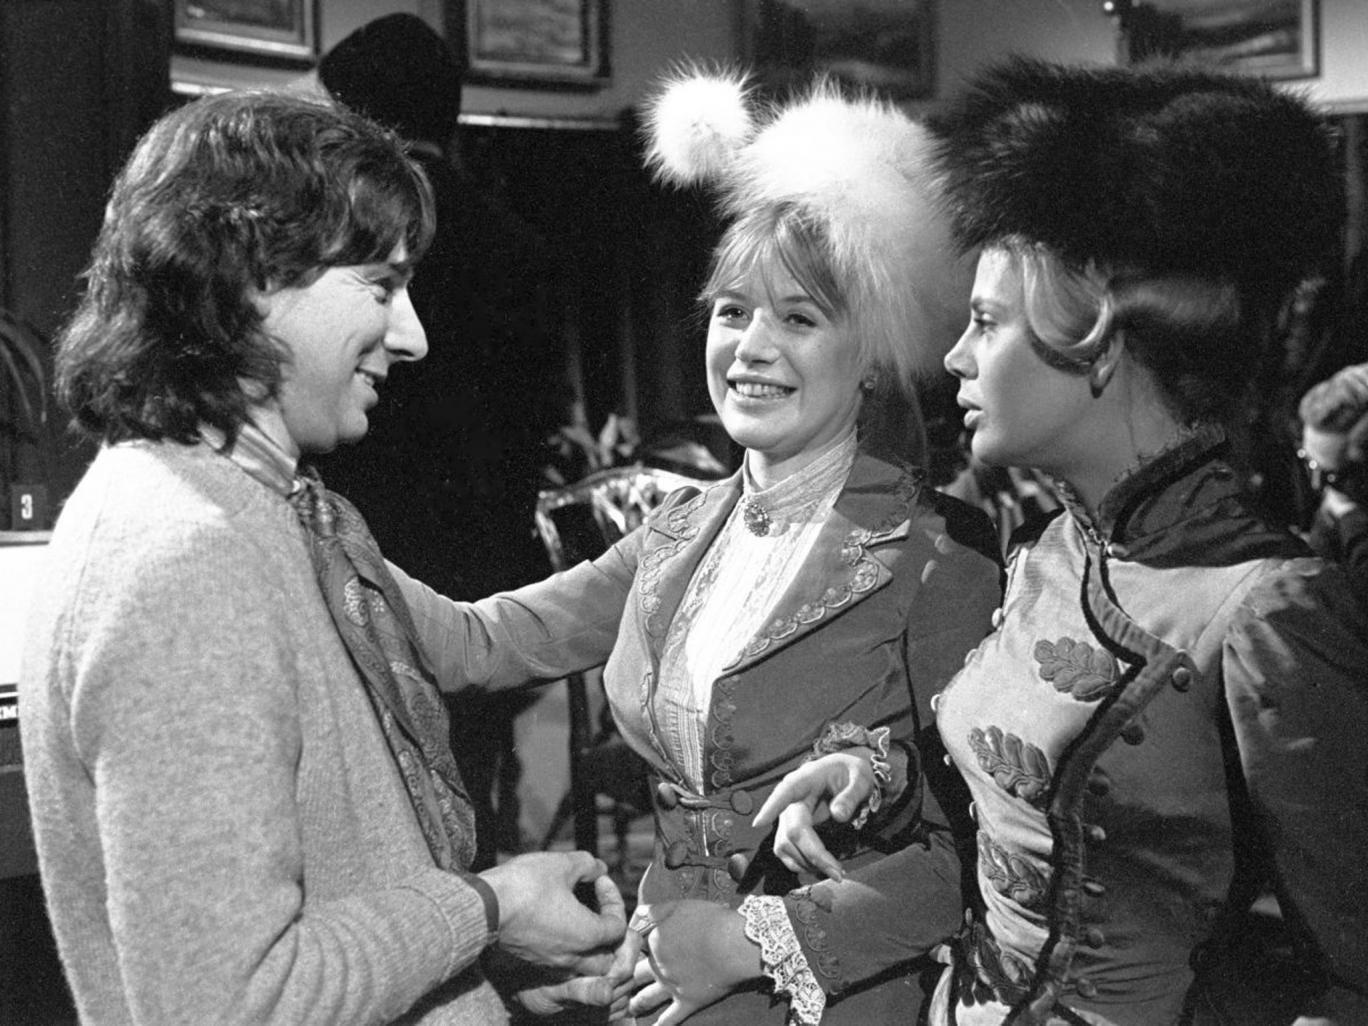 Garland directs Marianne Faithfull, left, and Britt Ekland in Strindberg's 'The Stronger' for ITV in 1971